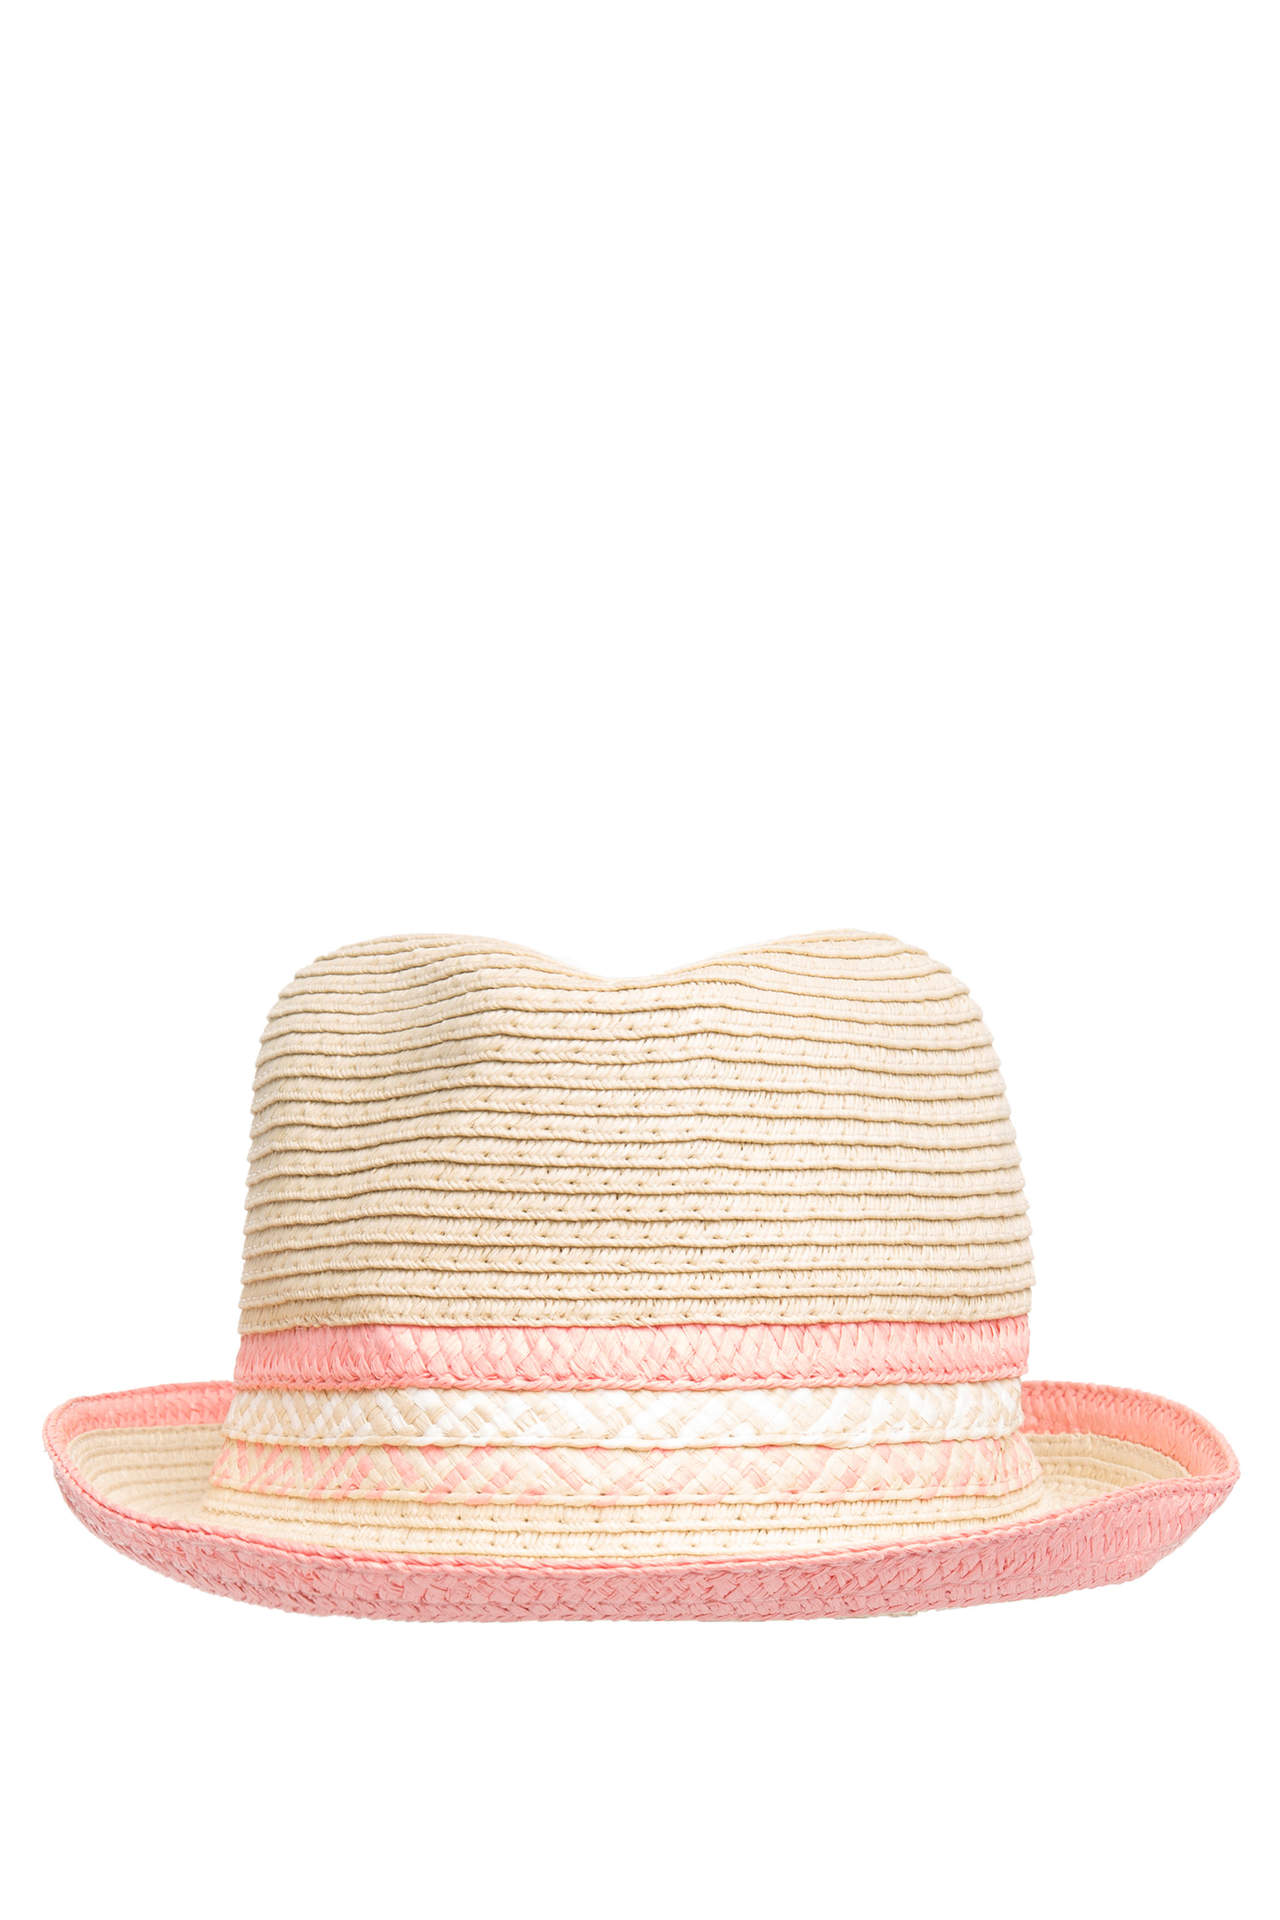 DeFacto Kız Çocuk Şapka Bej female